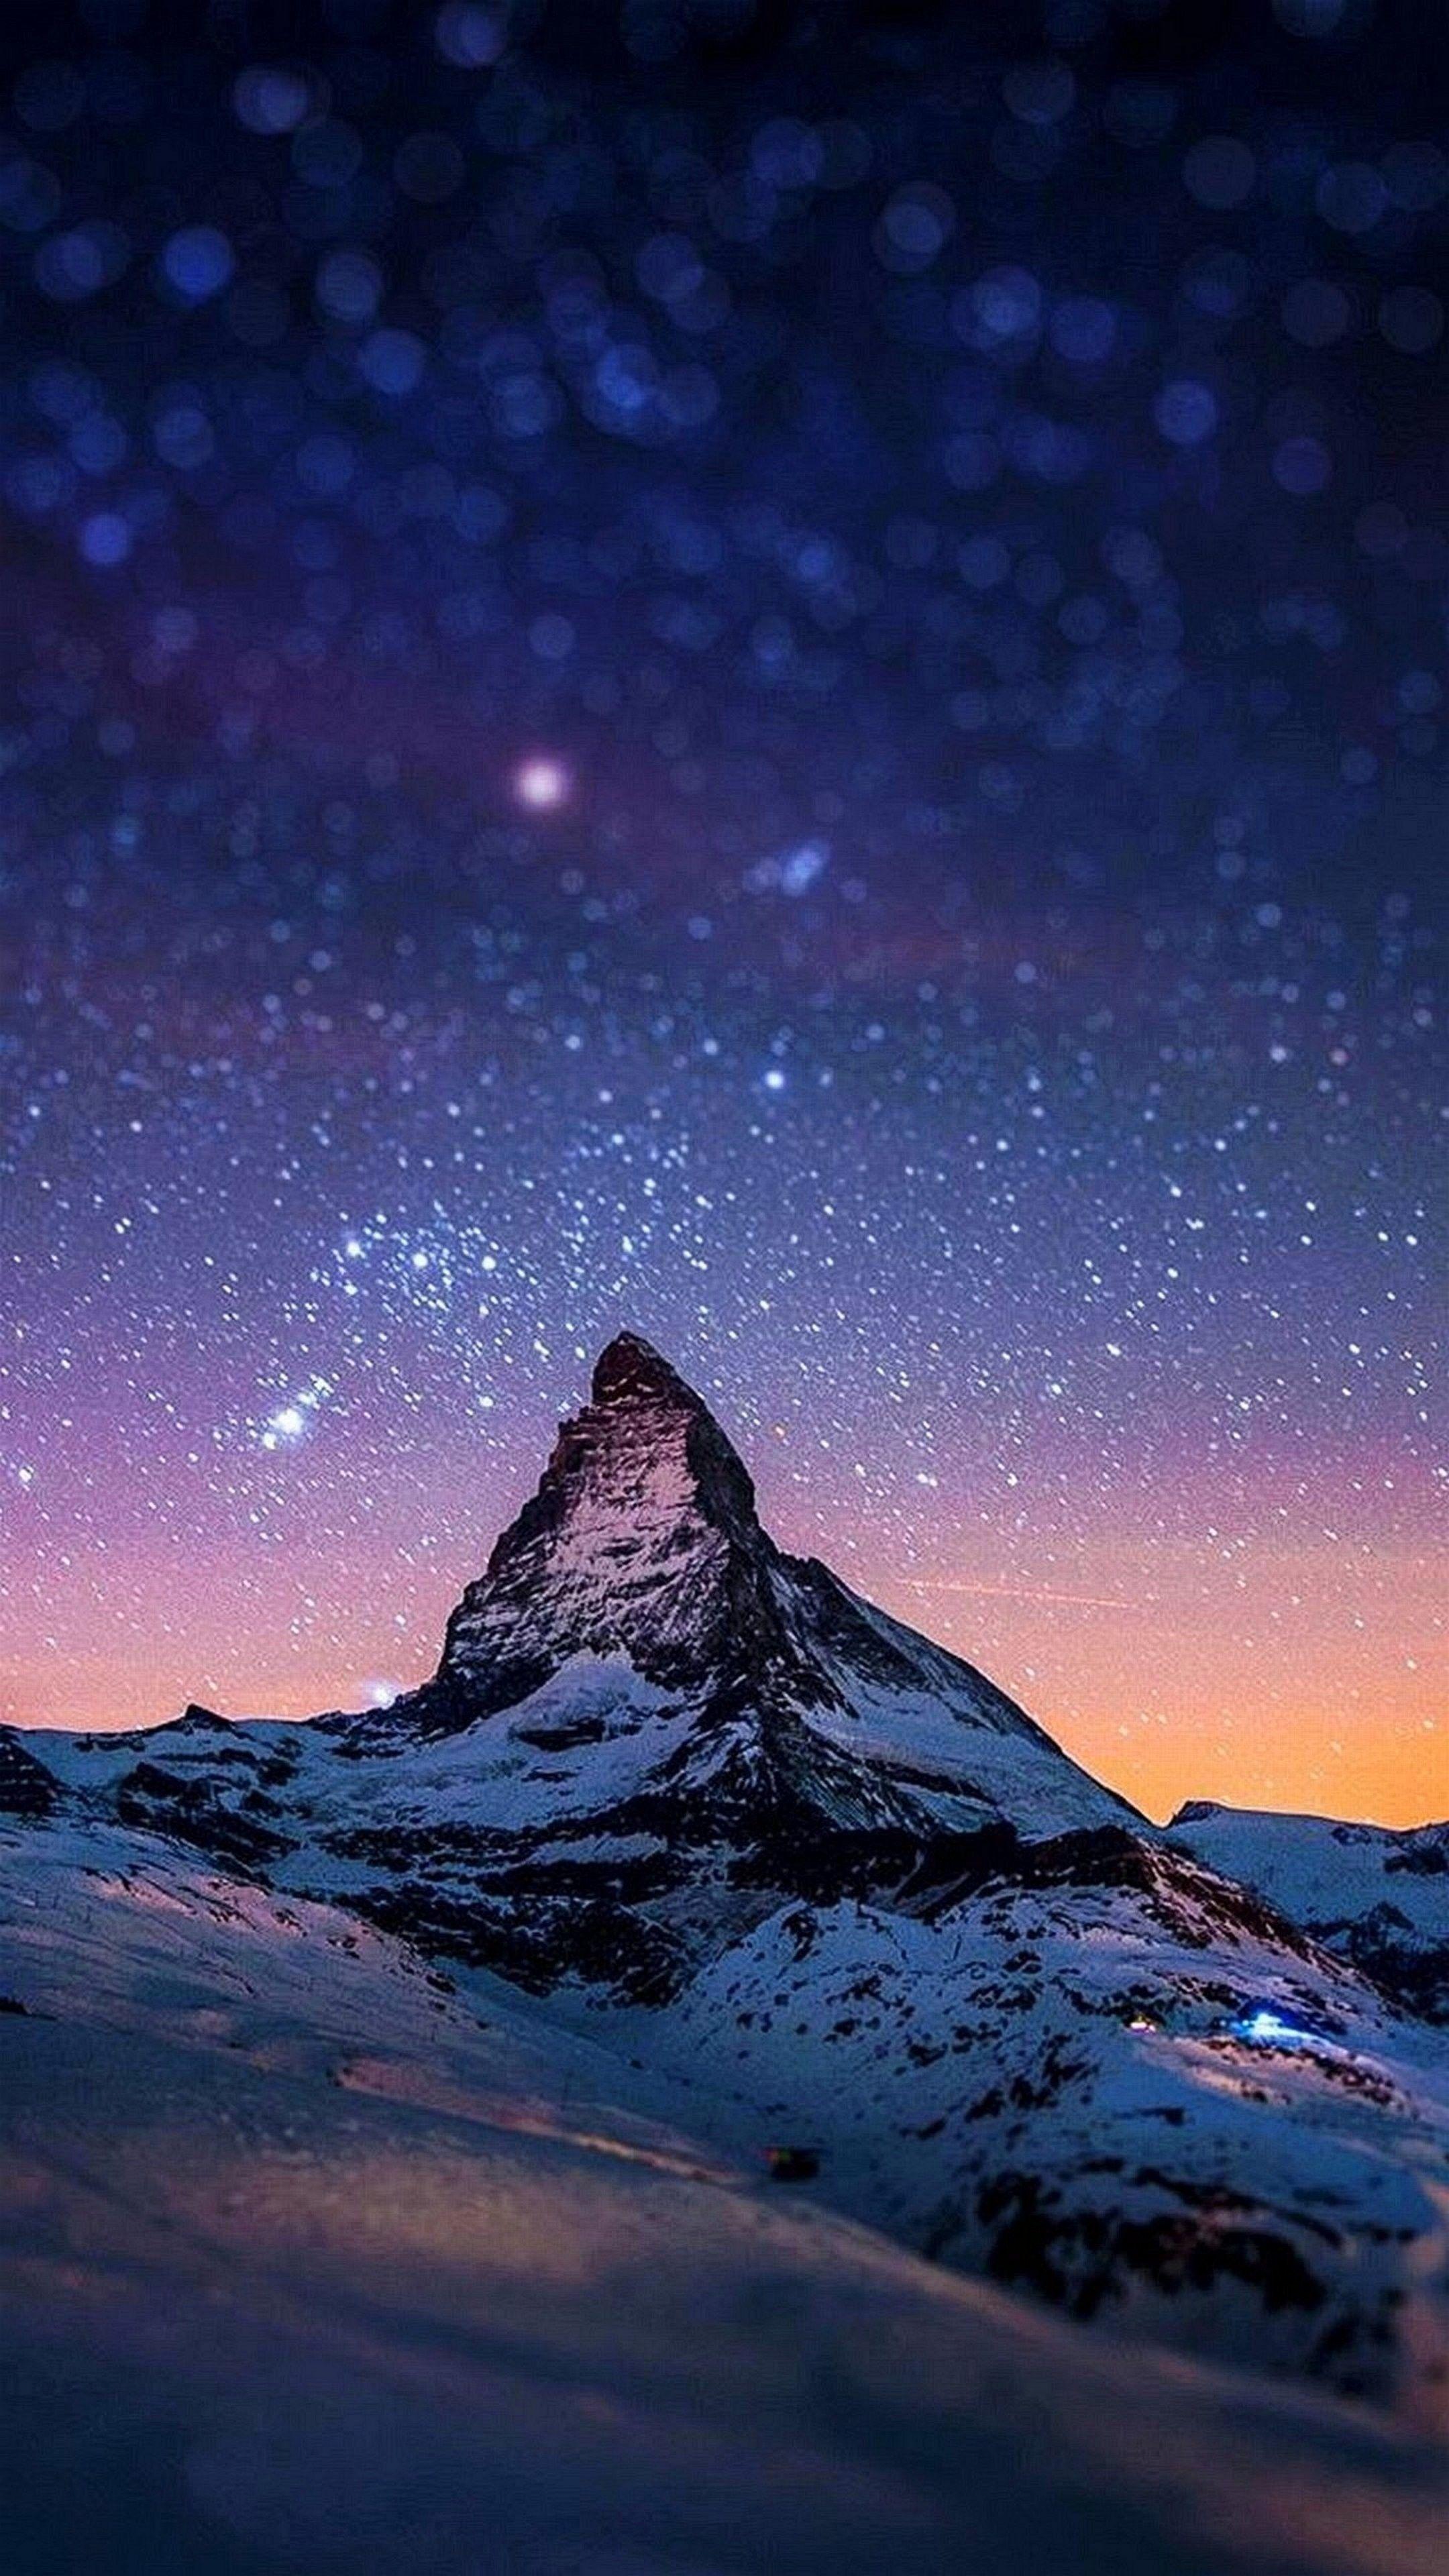 Sfondo Wallpaper Galaxy Note 5 Ultra Hd 2160 3840 97 Landscape Wallpaper Beautiful Night Sky Phone Wallpaper